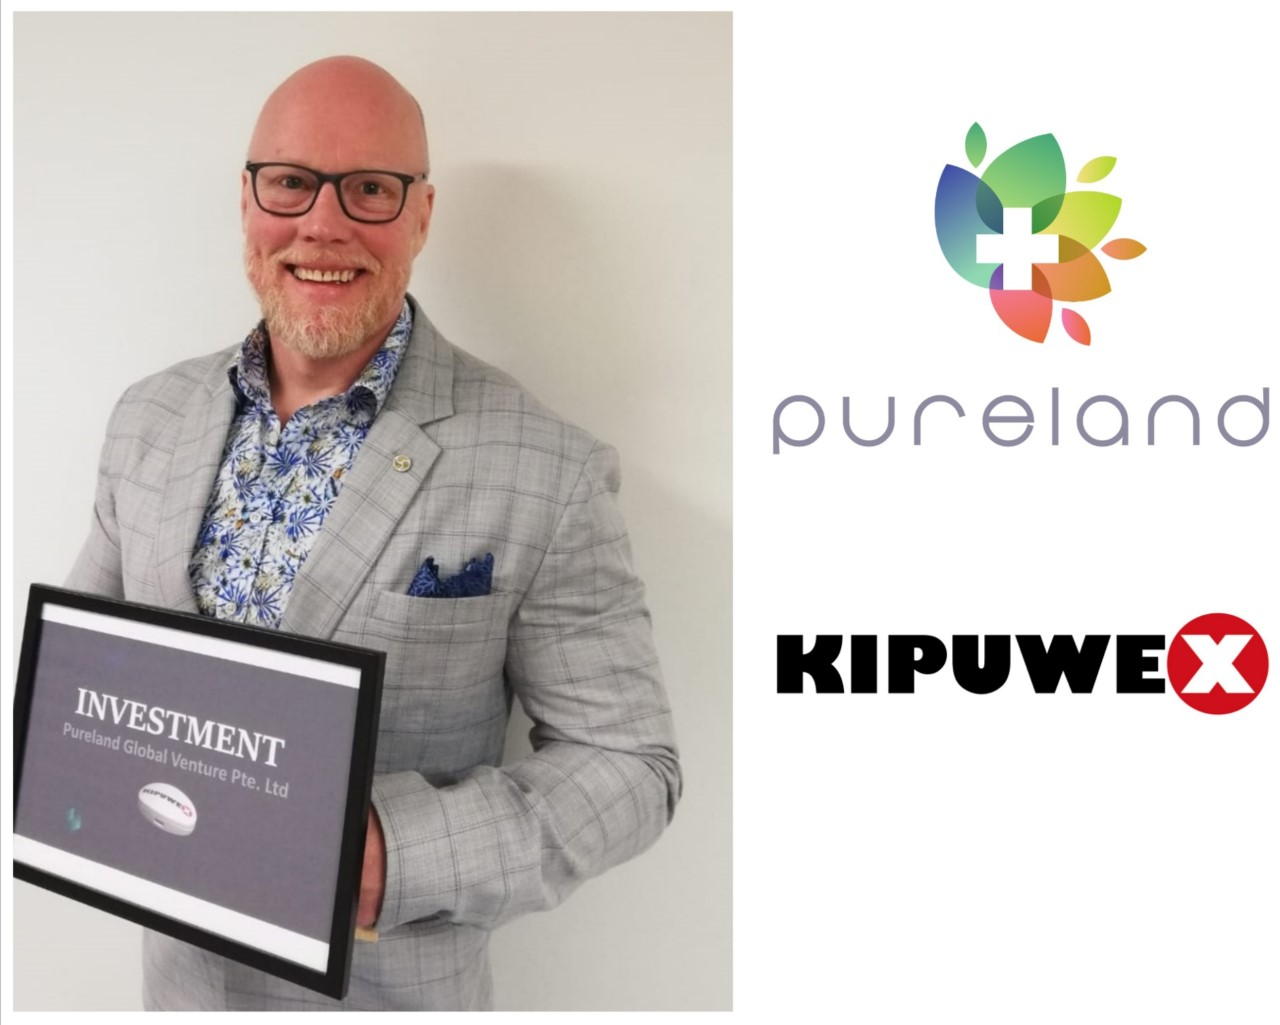 Pureland Global Venture invested in Kipuwex